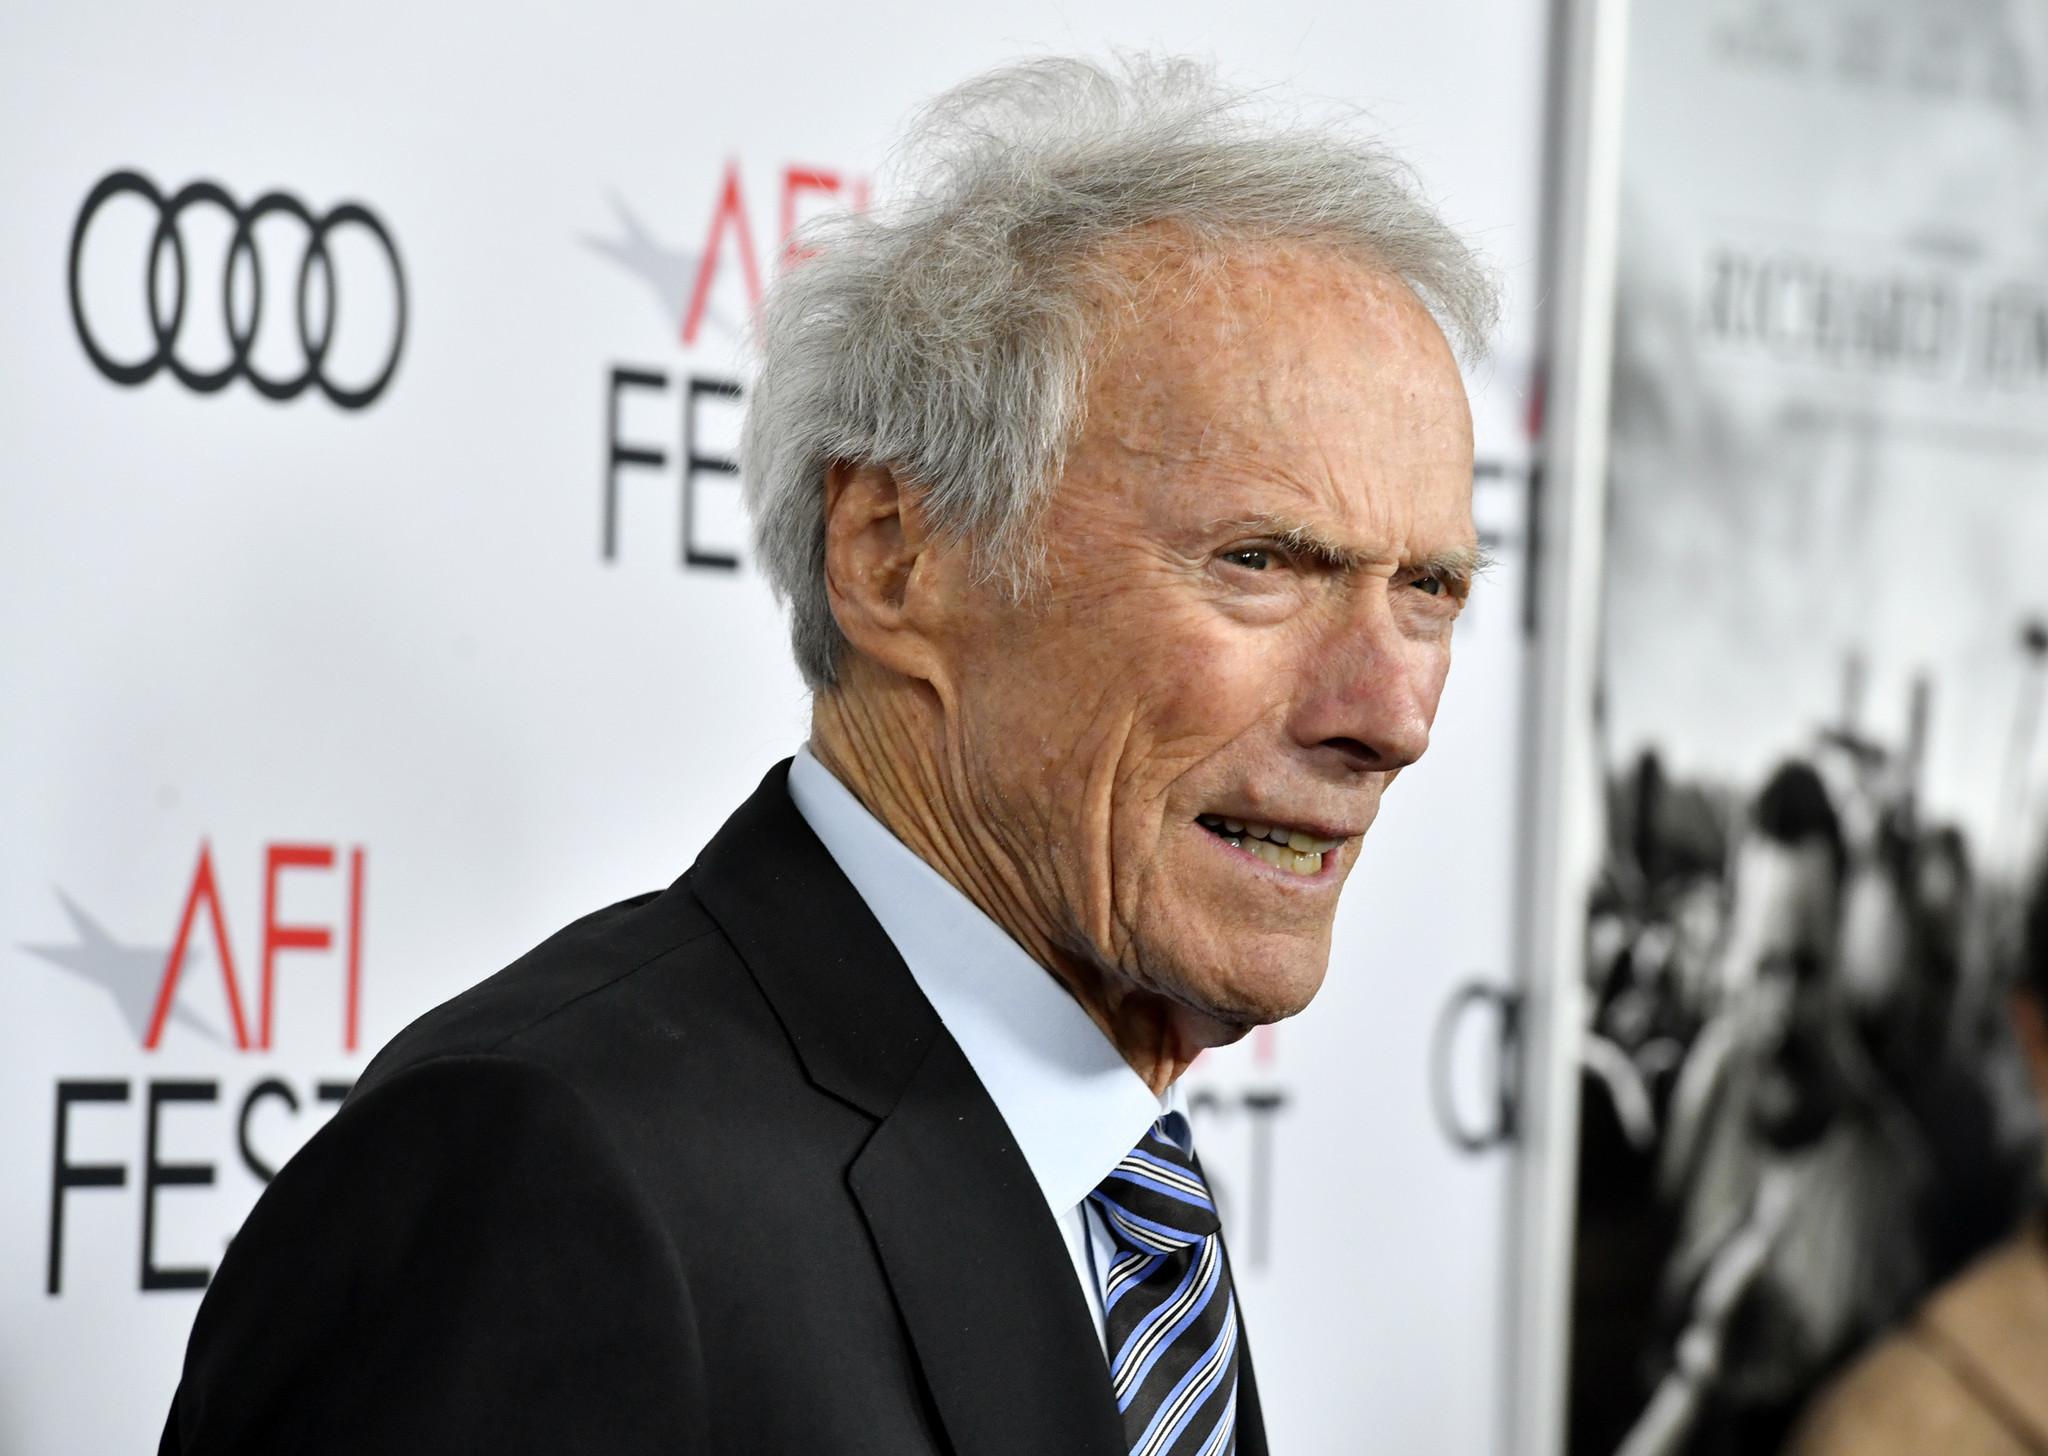 Clint Eastwood endorses Michael Bloomberg over Trump